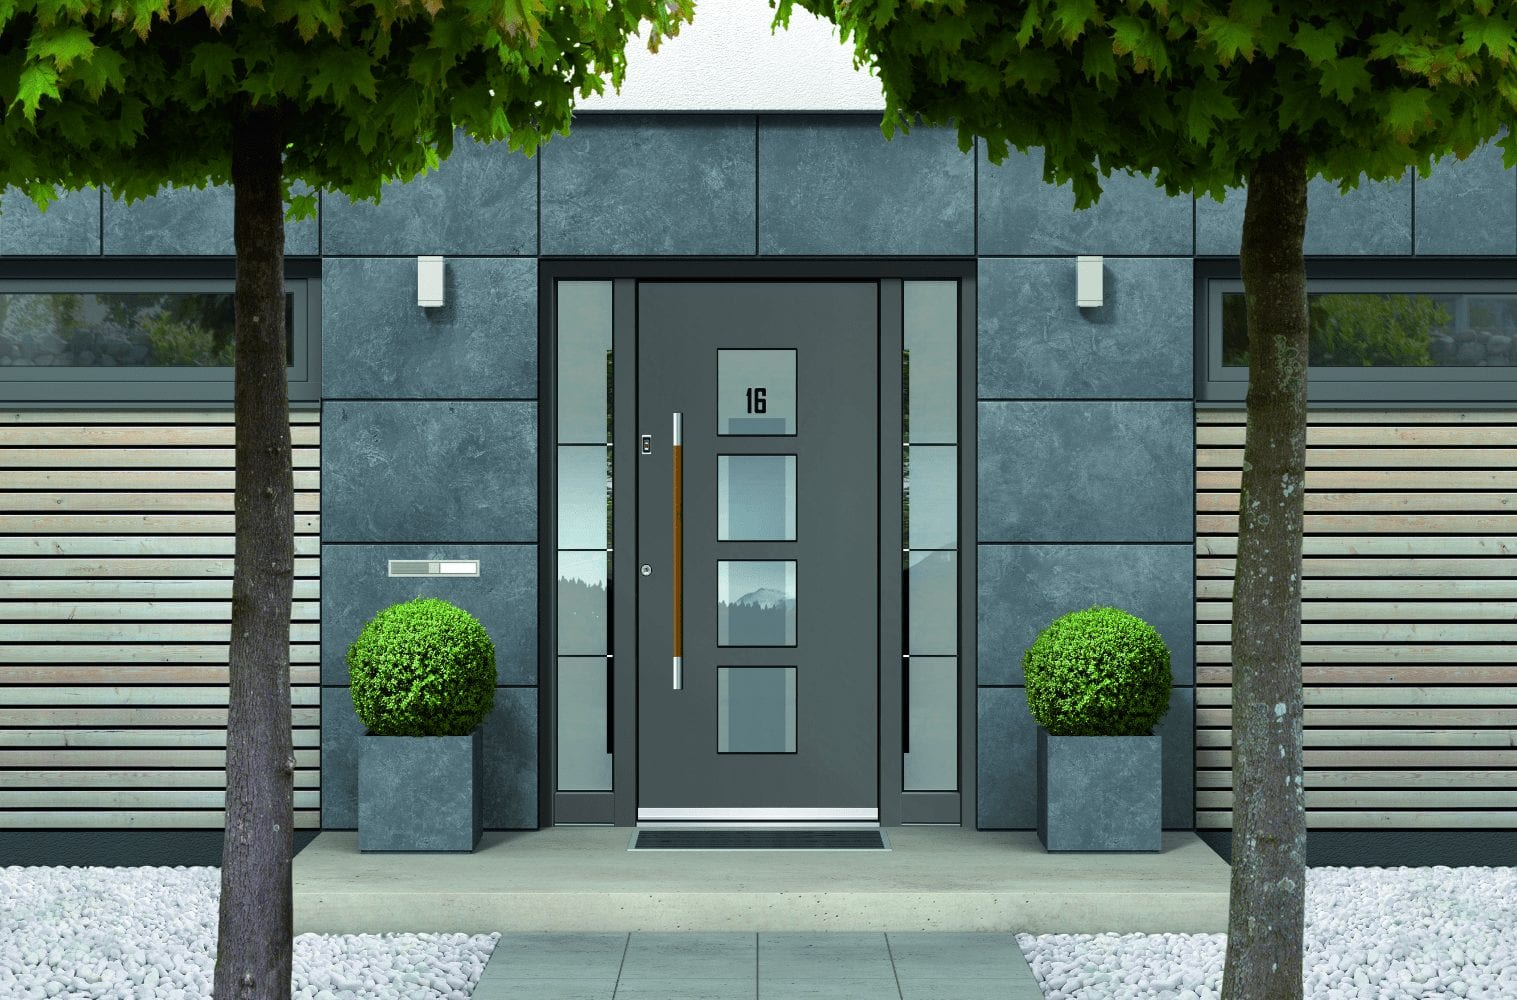 foto_AdobeStock_284087432_┬ę Wilm Ihlenfeld - stock.adobe.com_Montage_01_4c